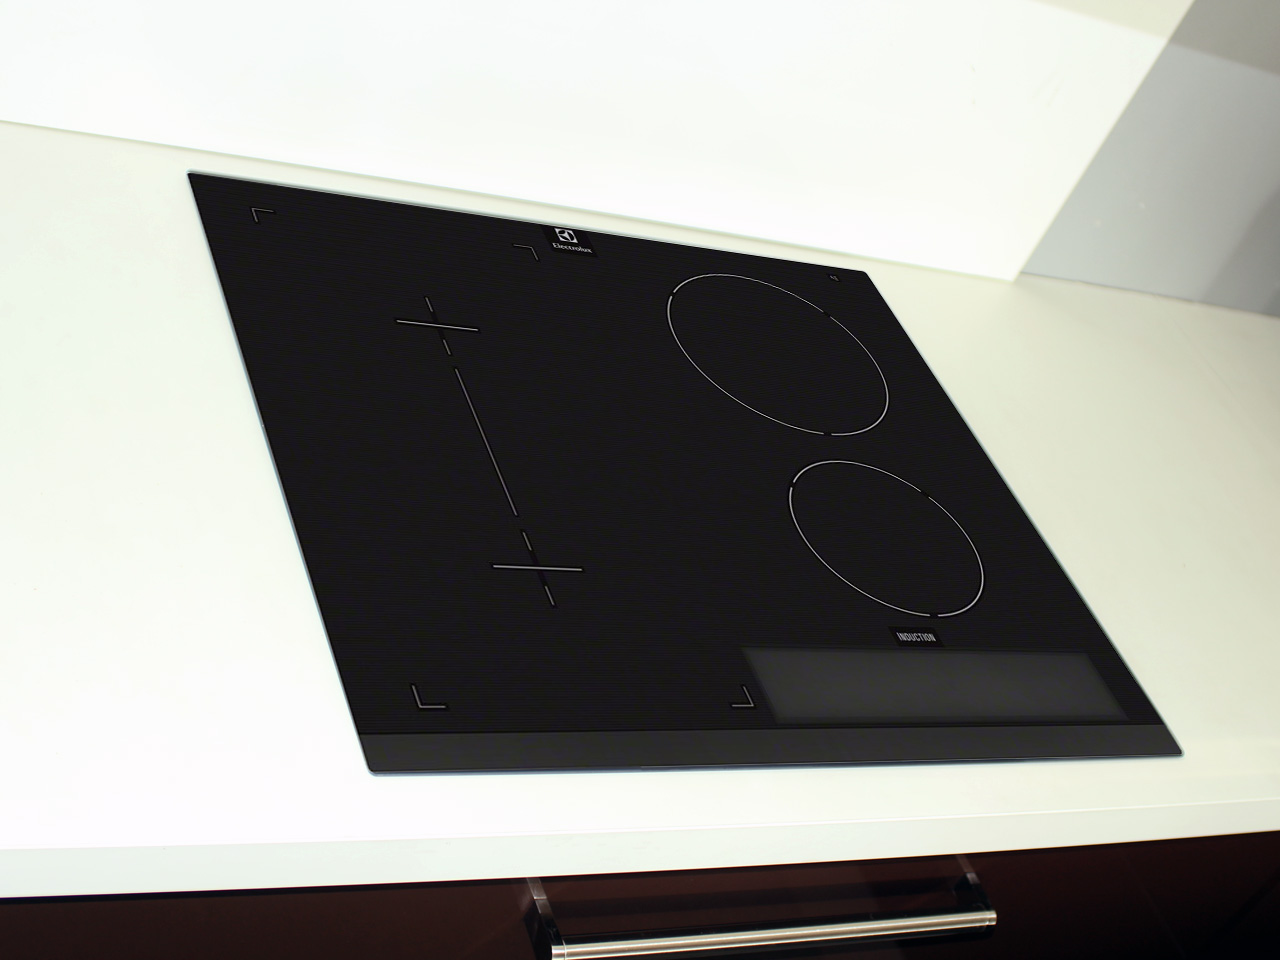 59 cm electrolux einbau induktion kochfeld topferkennung. Black Bedroom Furniture Sets. Home Design Ideas